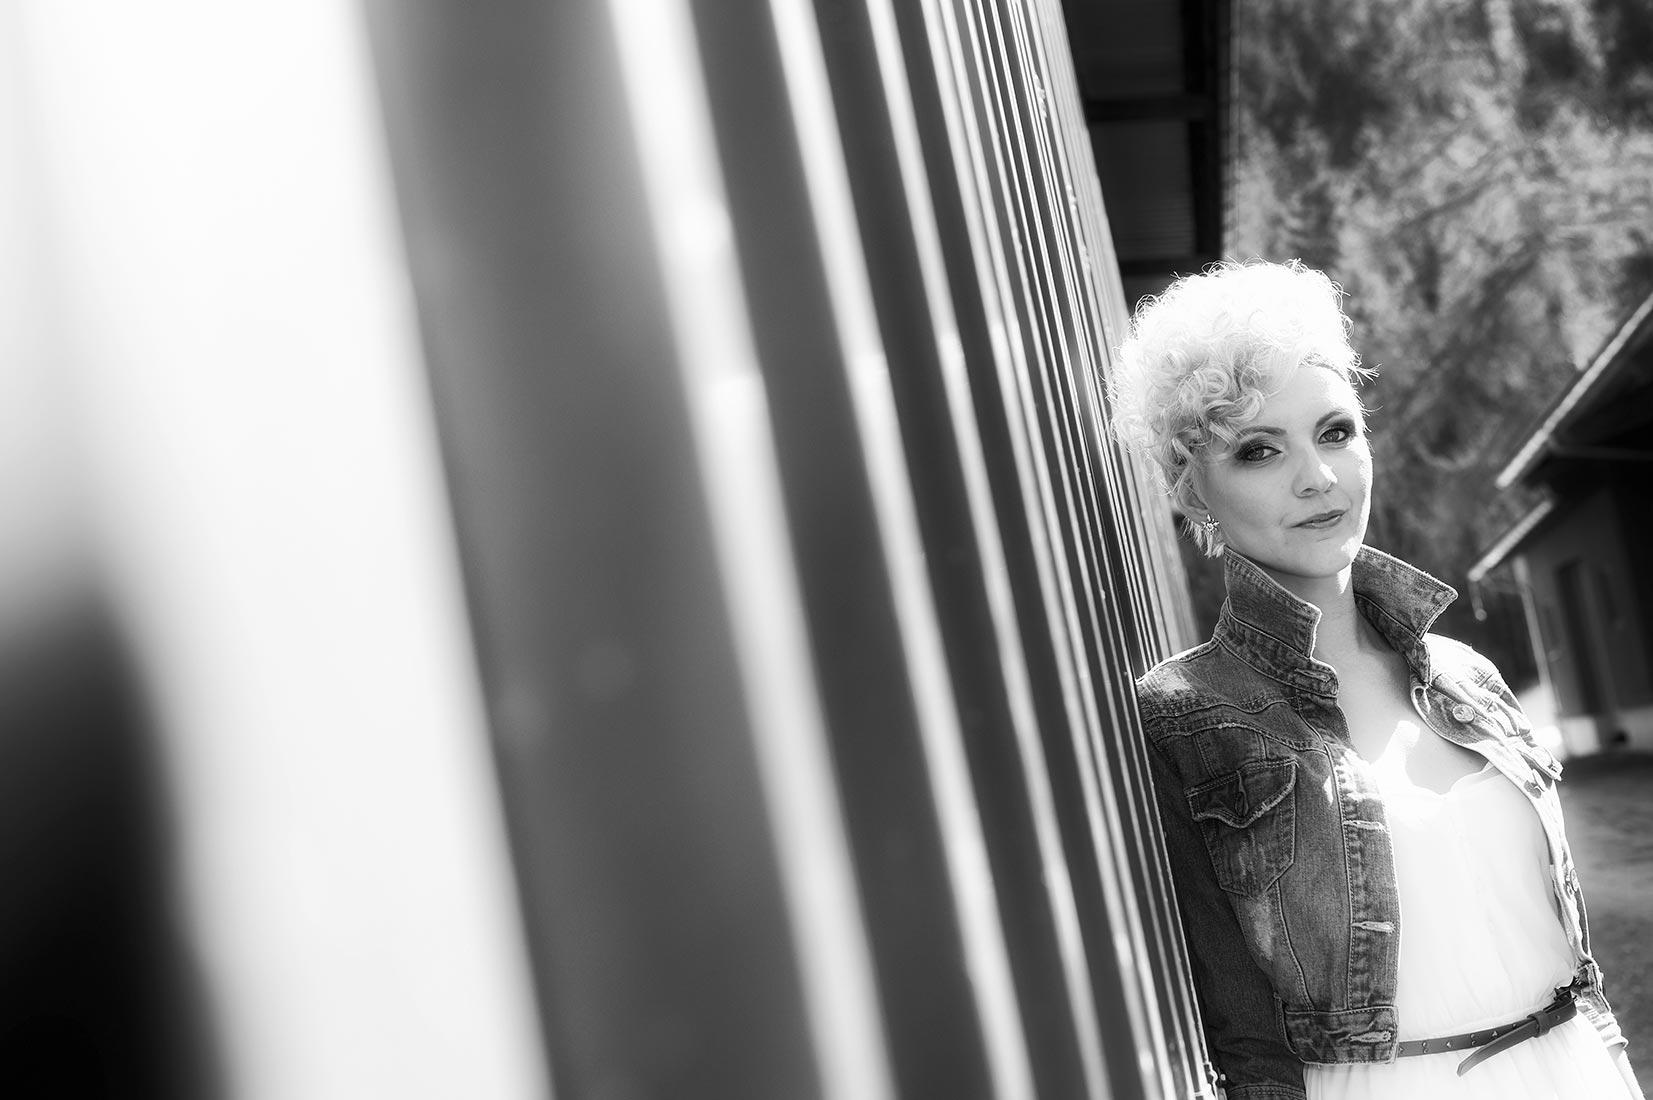 Portraitfotos – Beautyshot Anita outdoor, schwarz-weiß